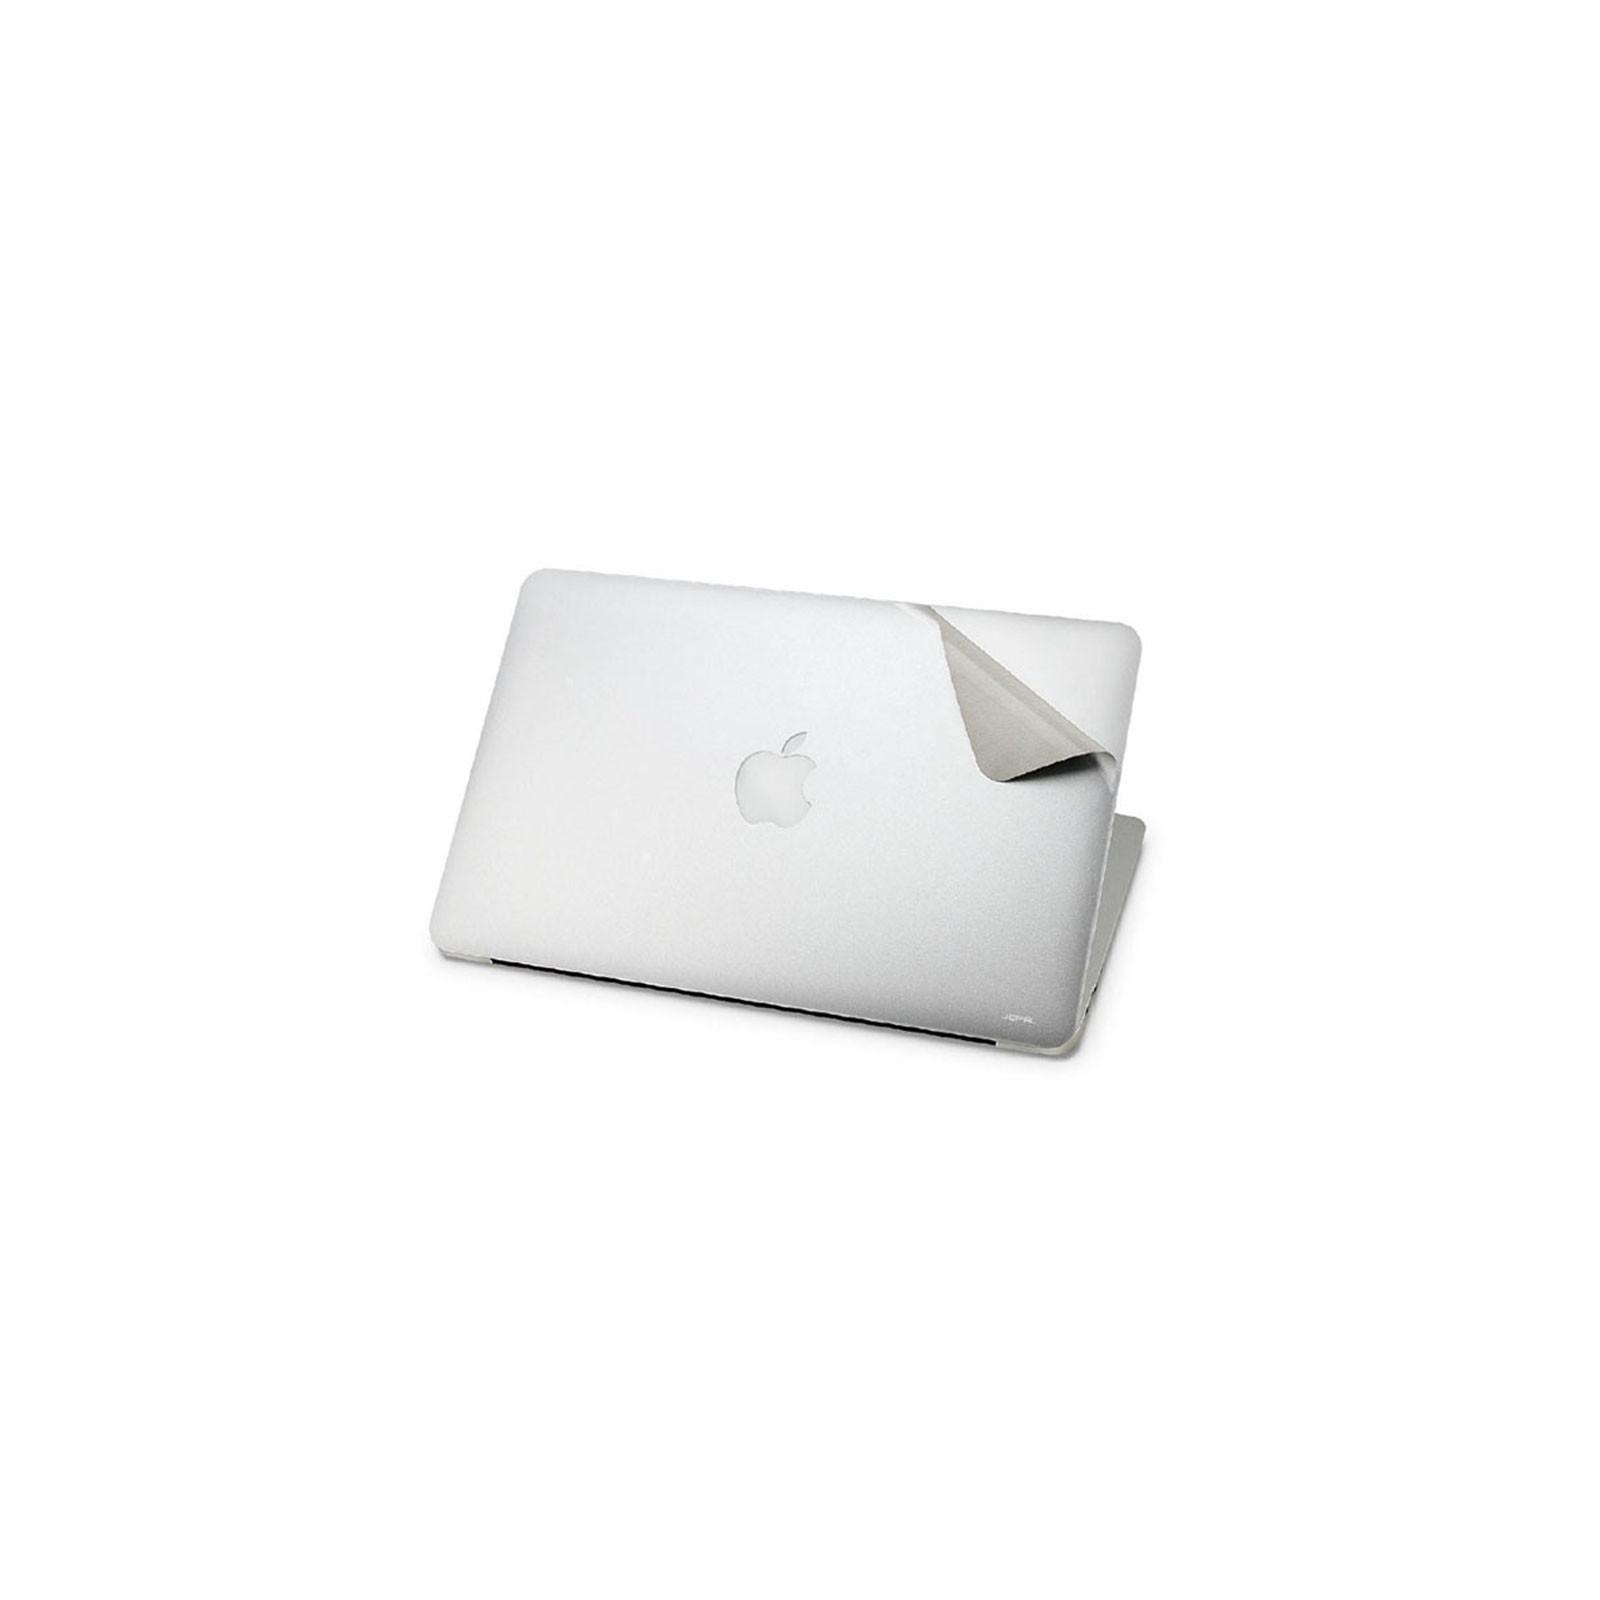 Пленка защитная JCPAL 3 in 1 set для MacBook Pro 15 (JCP2046) изображение 3